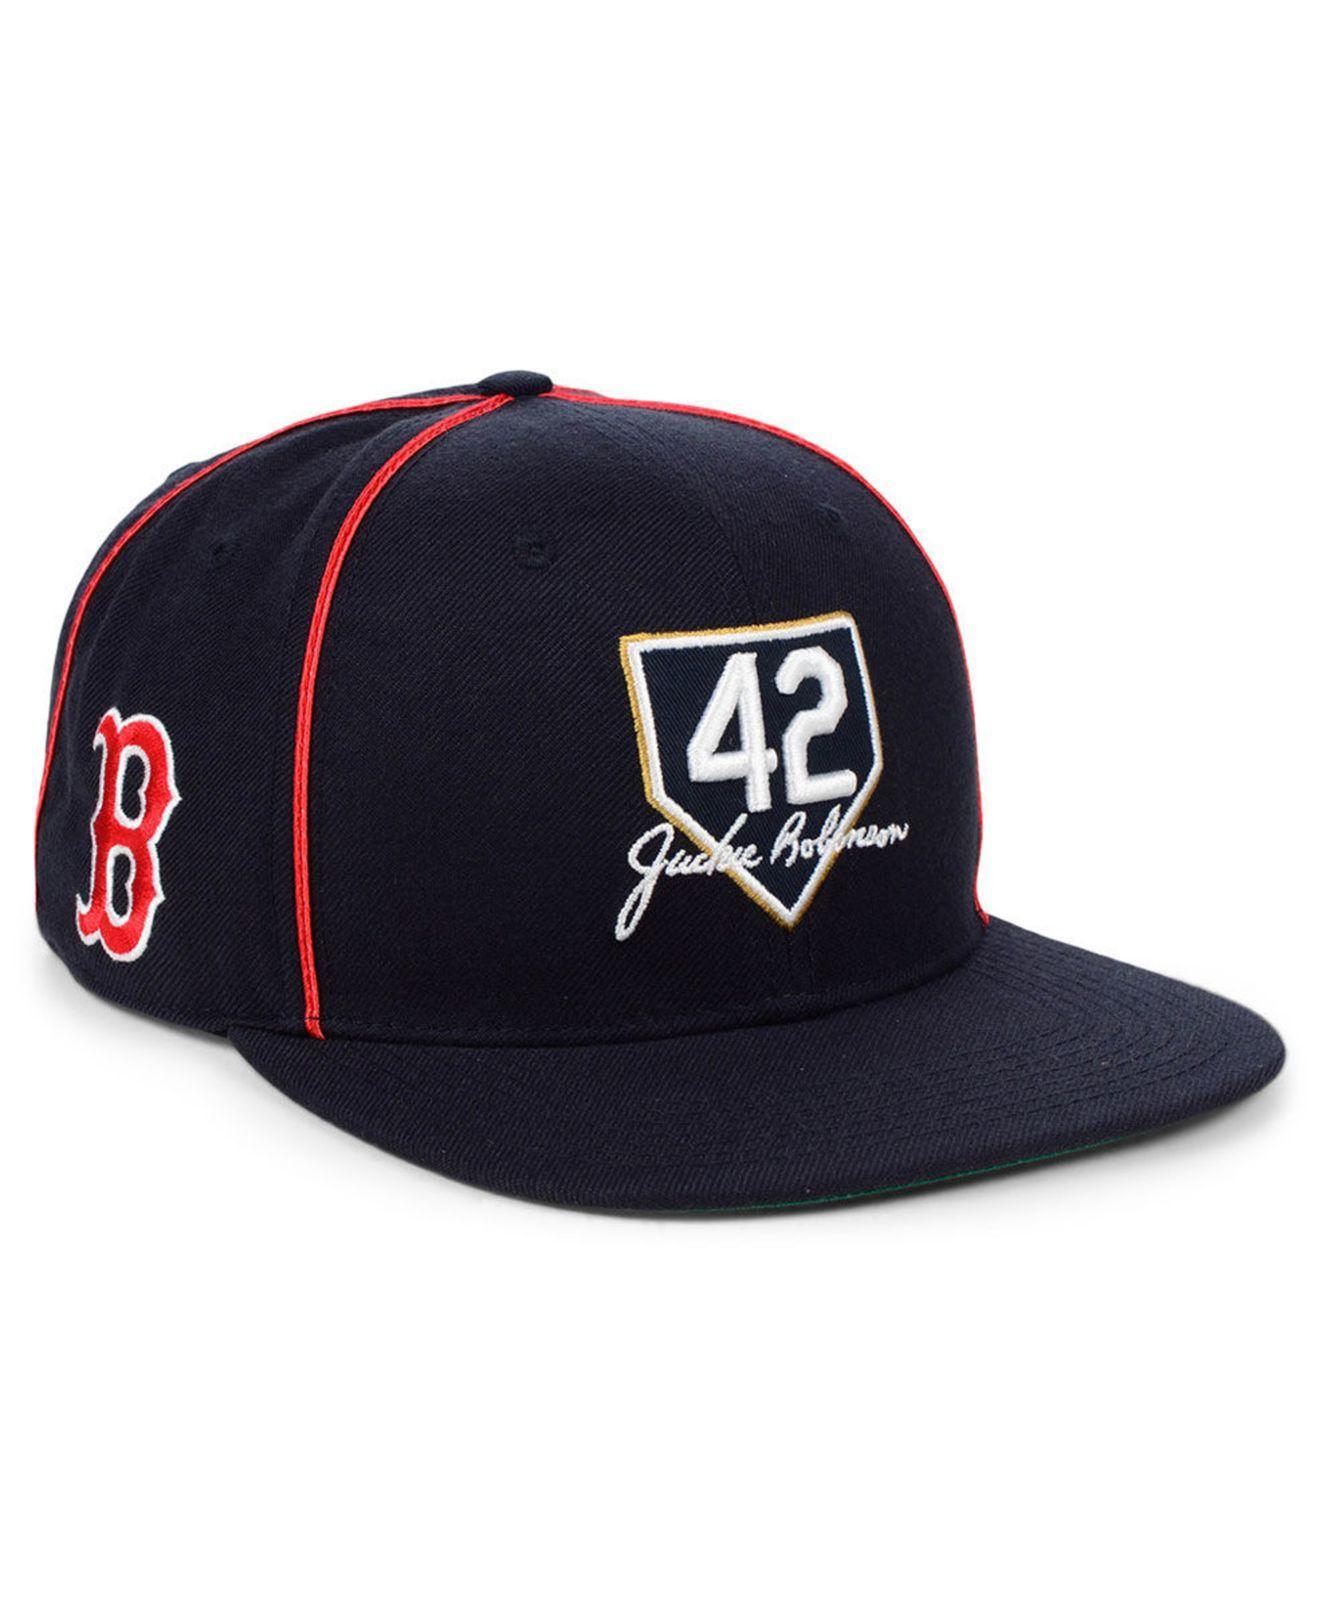 new concept 5200f 12c6d 47 Brand. Men s Blue Boston Red Sox Jackie Robinson 42 Team Snapback Cap